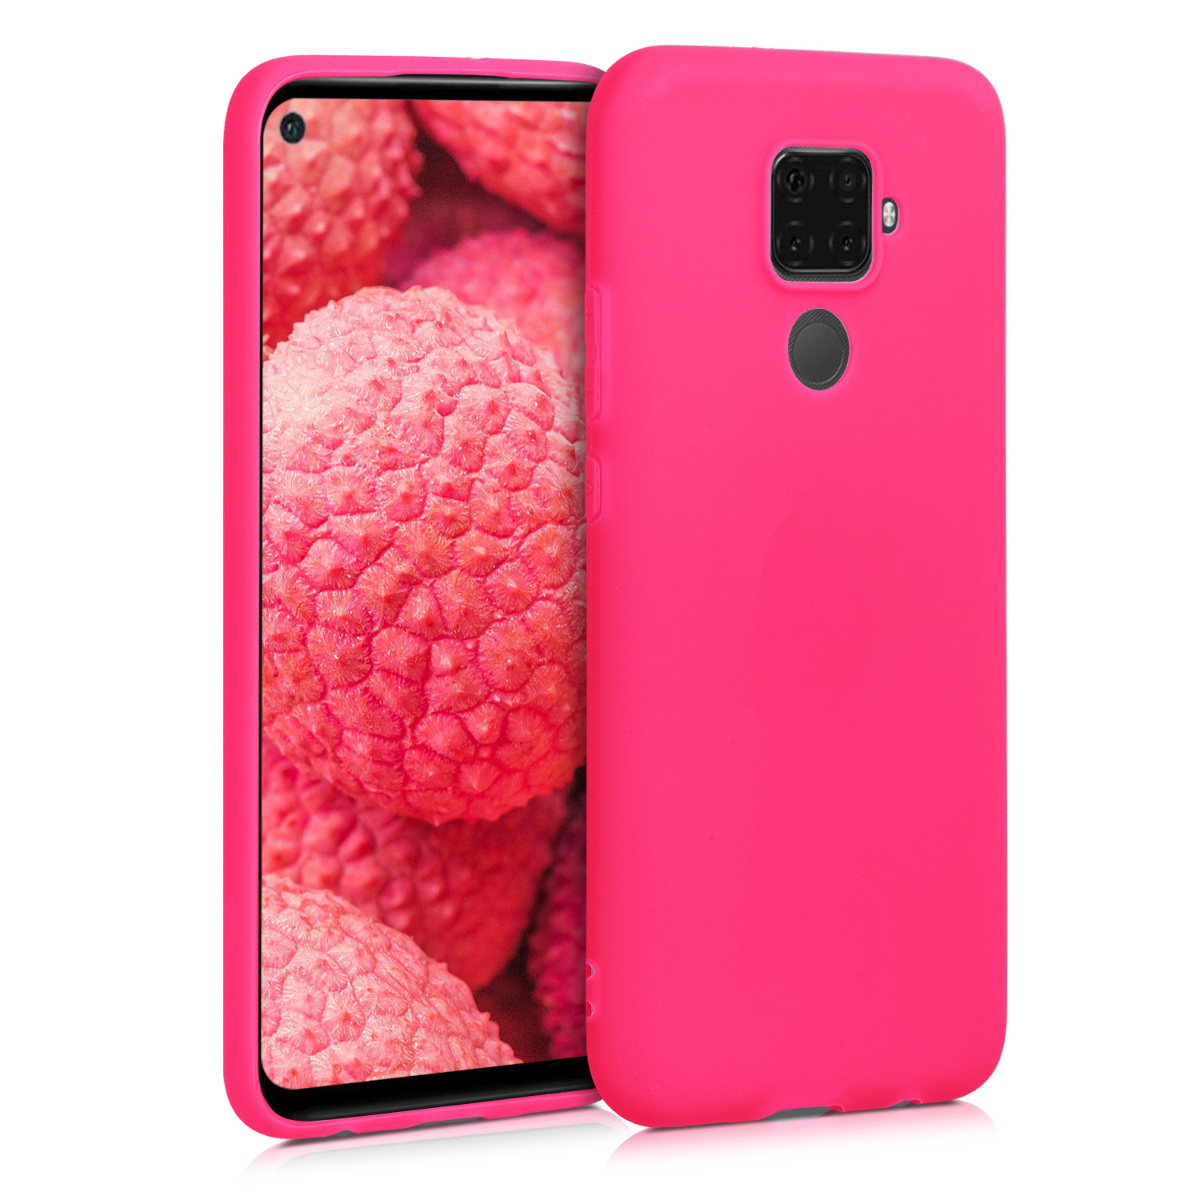 KW Θήκη Σιλικόνης Huawei Mate 30 Lite - Neon Pink (50153.77)